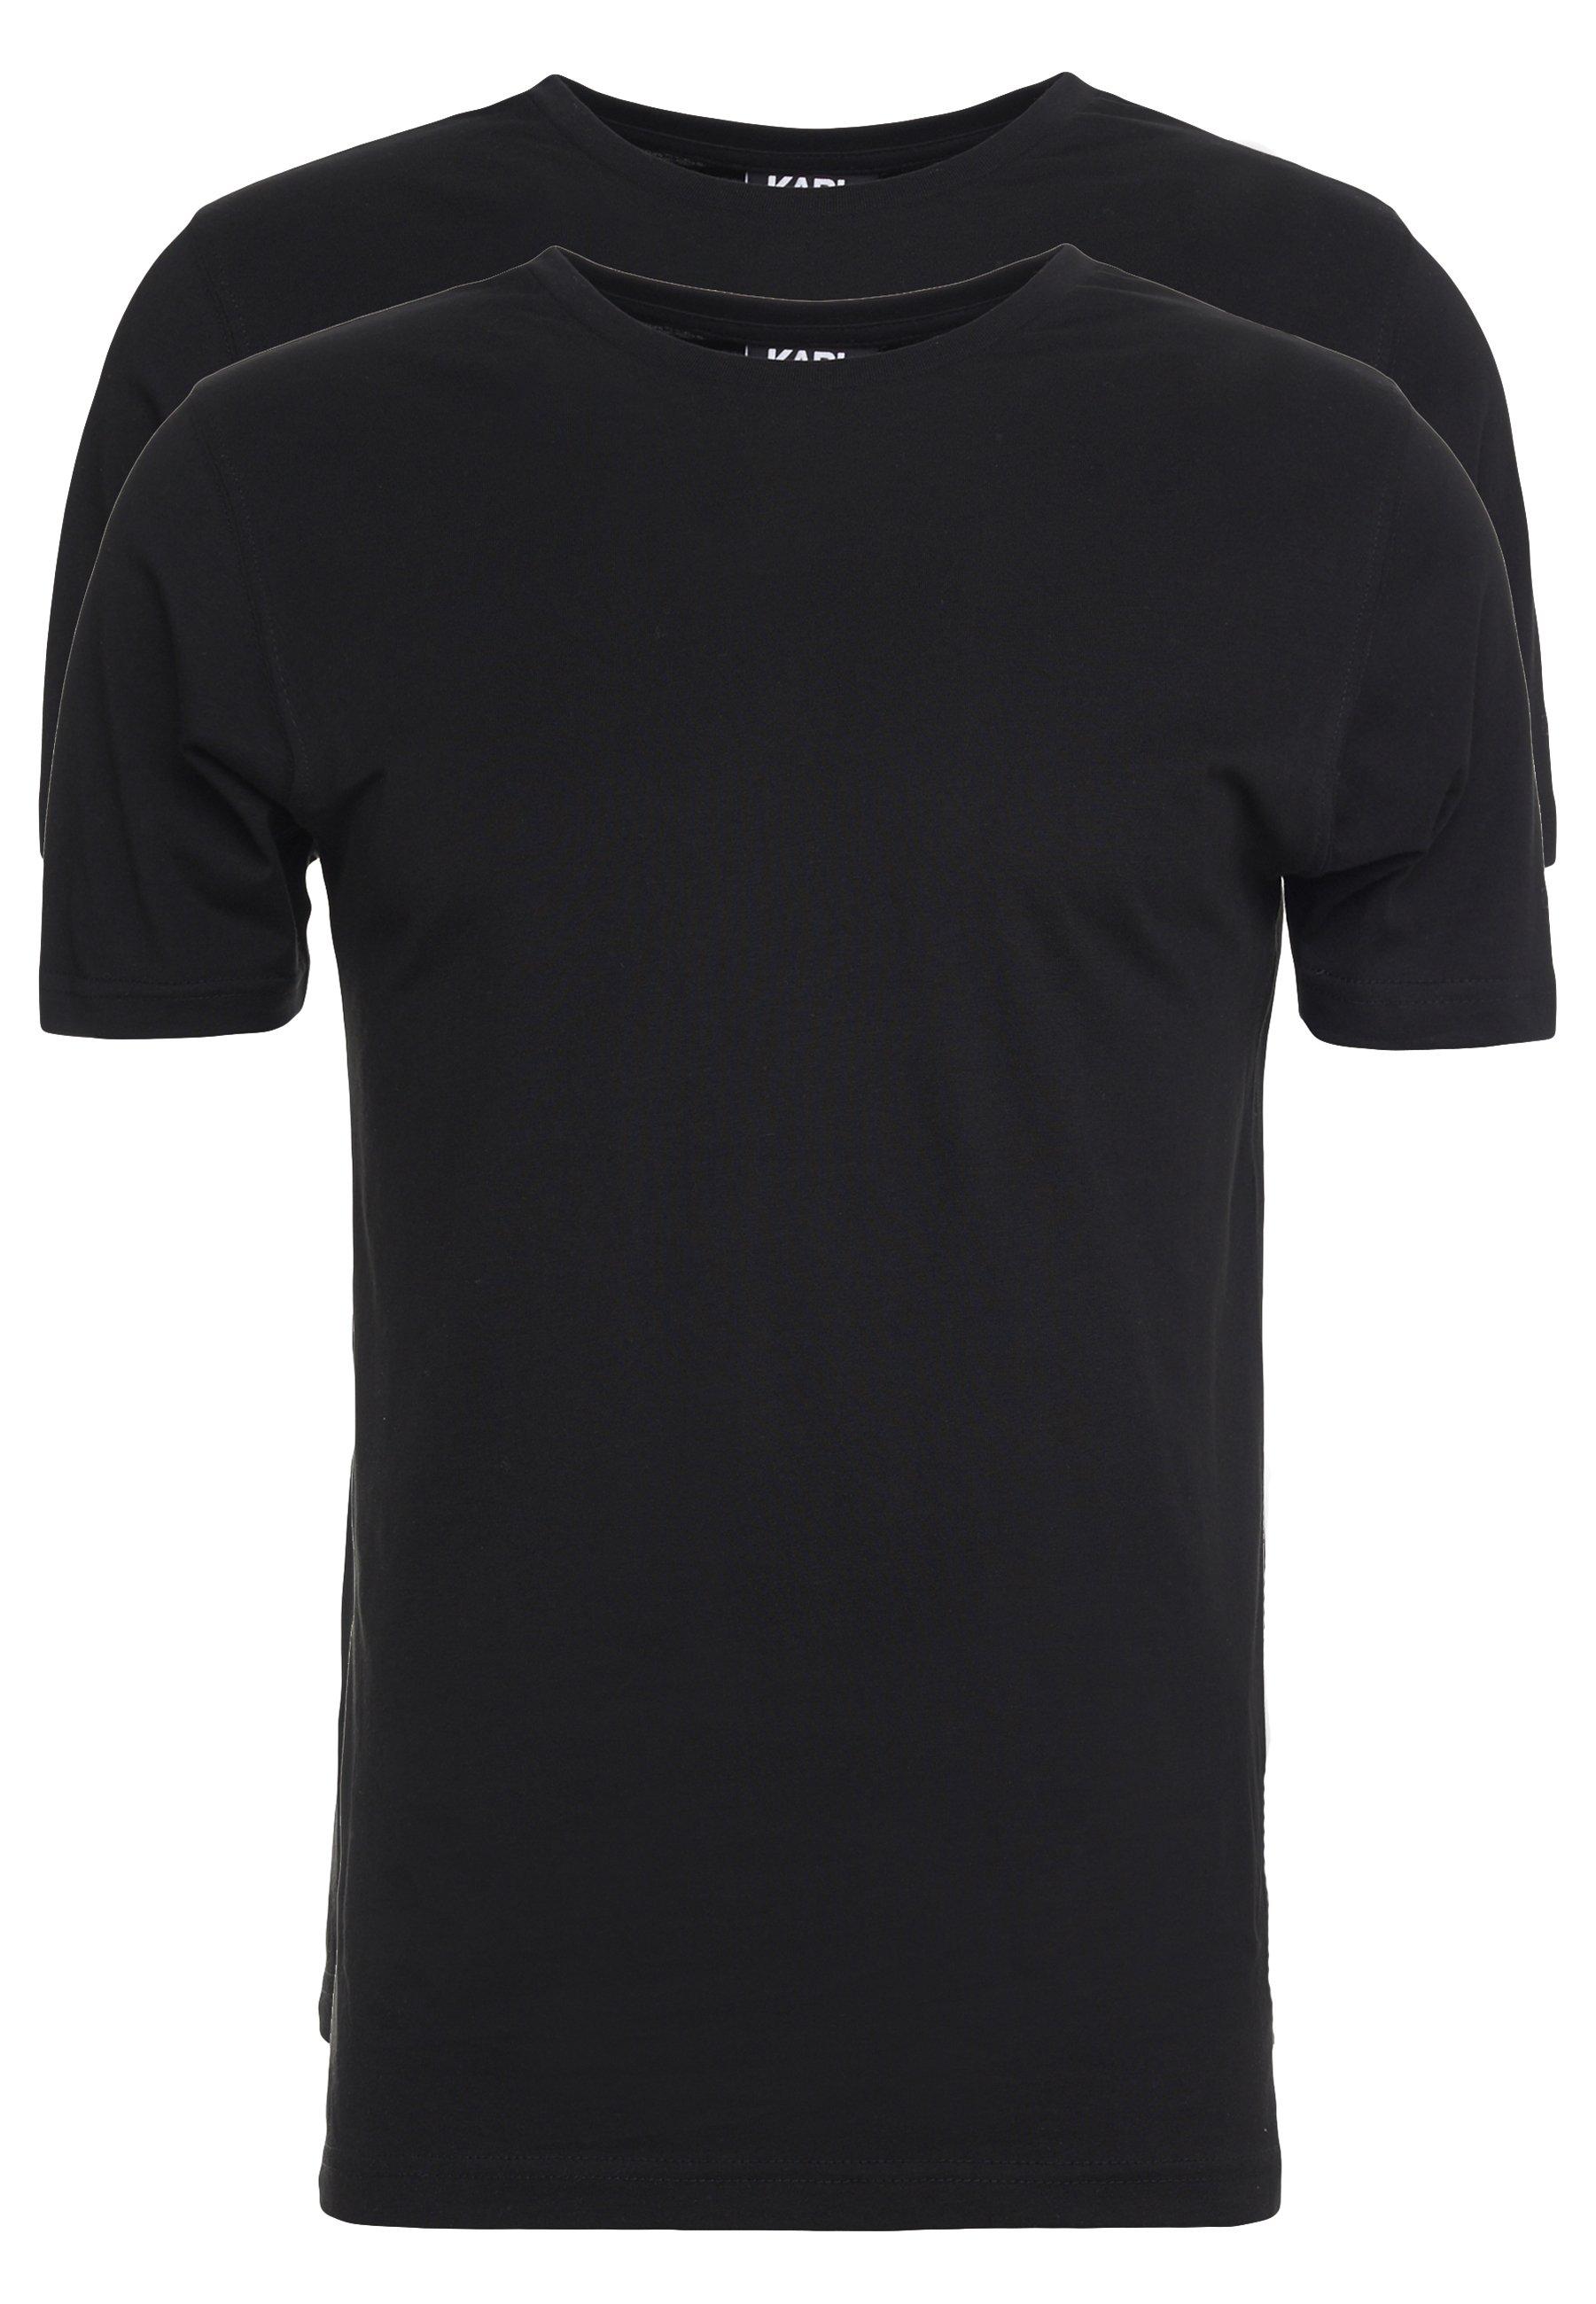 Karl Lagerfeld Crew Neck 2 Pack - T-shirts Black